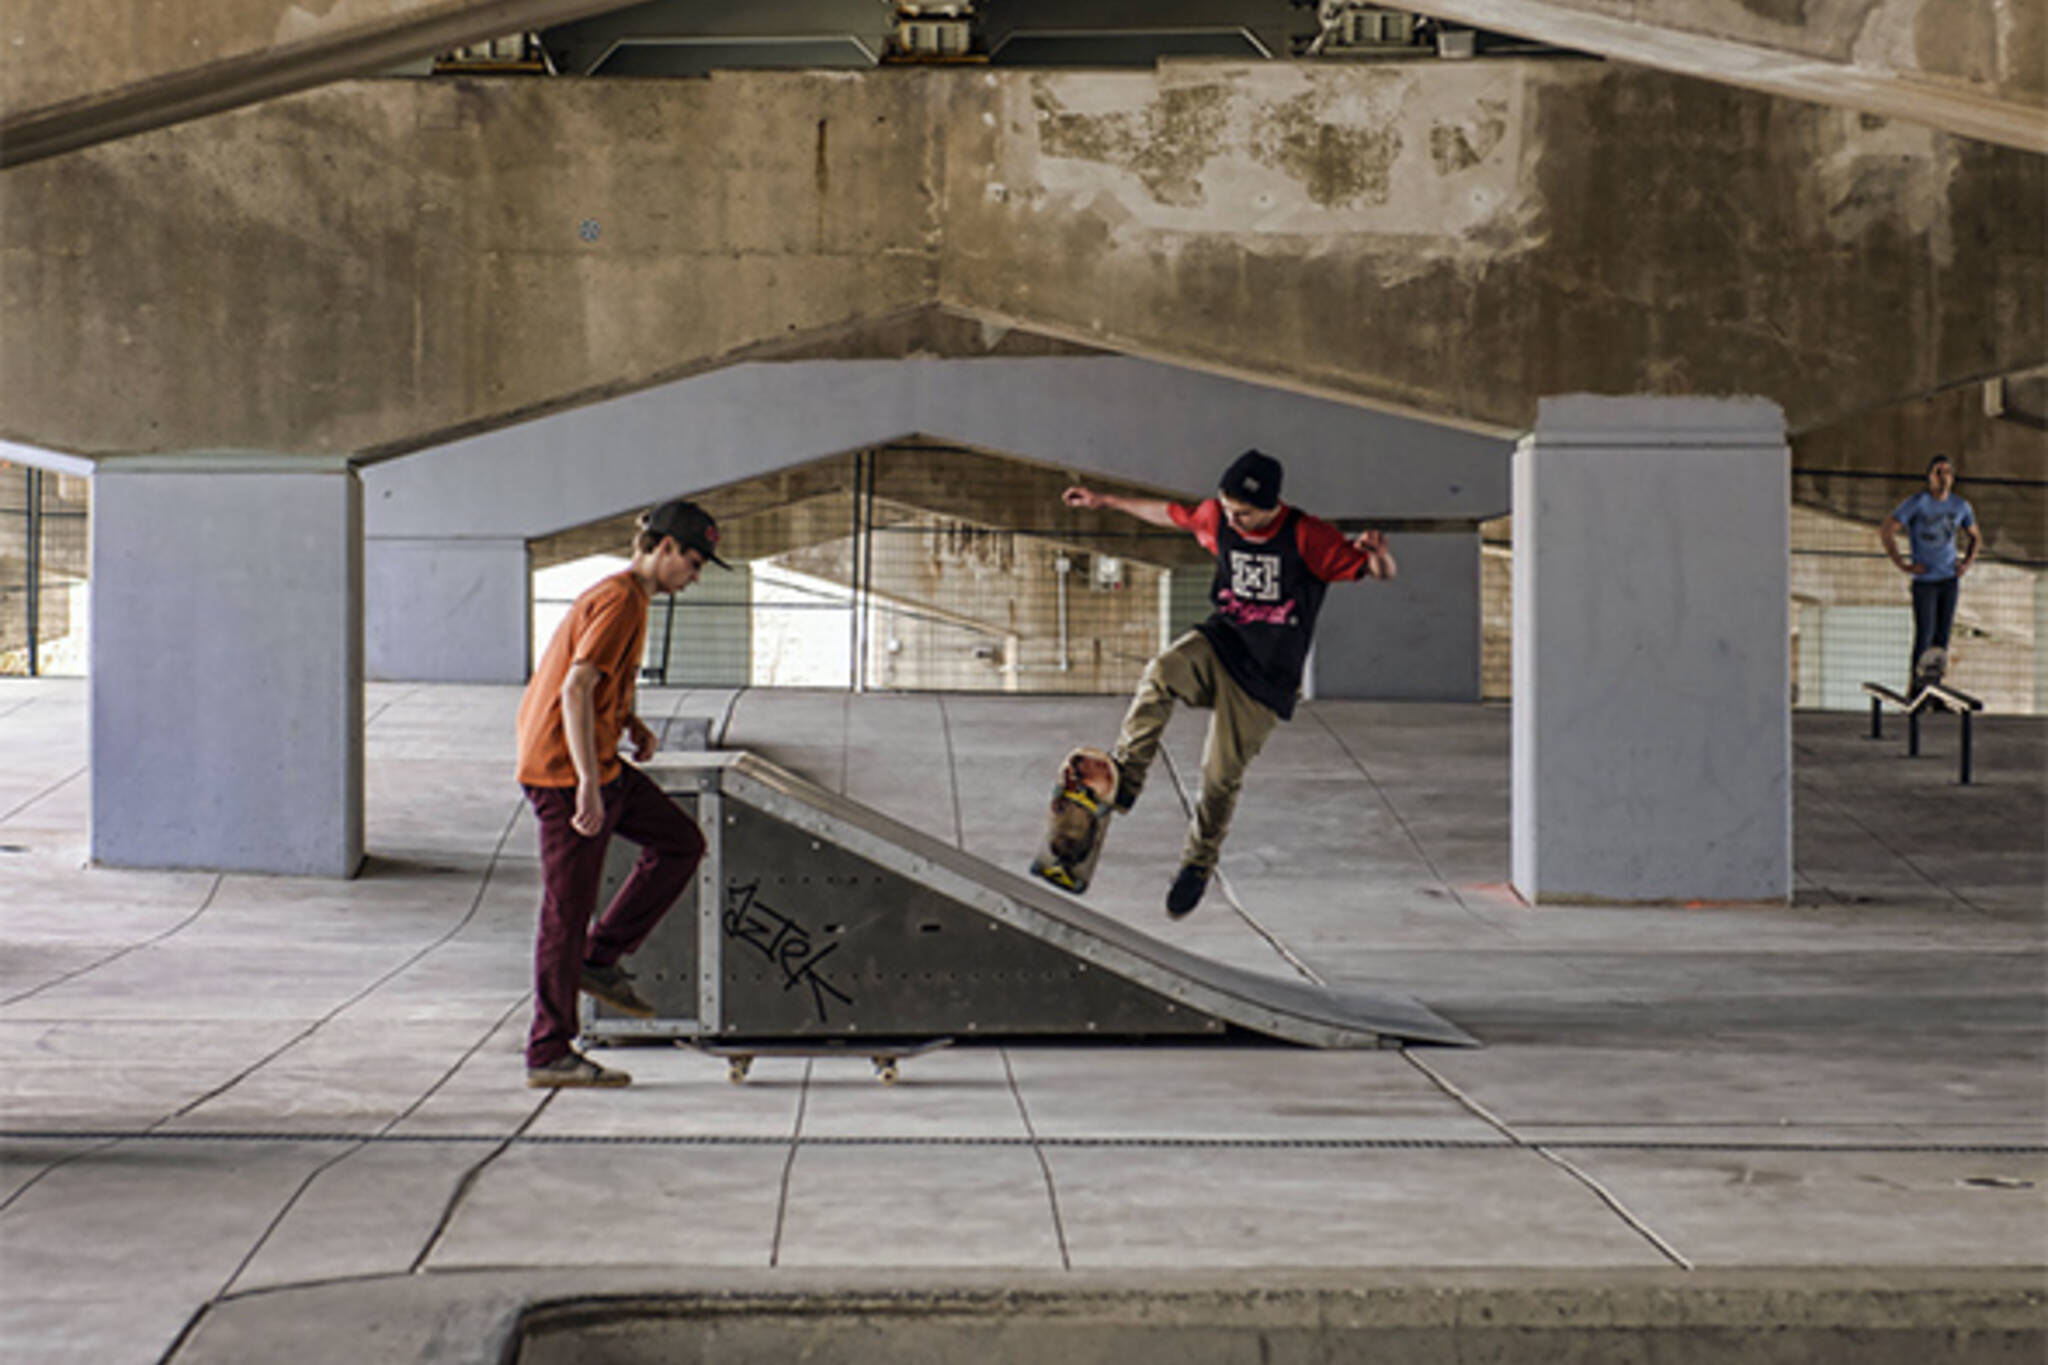 skateboard park toronto